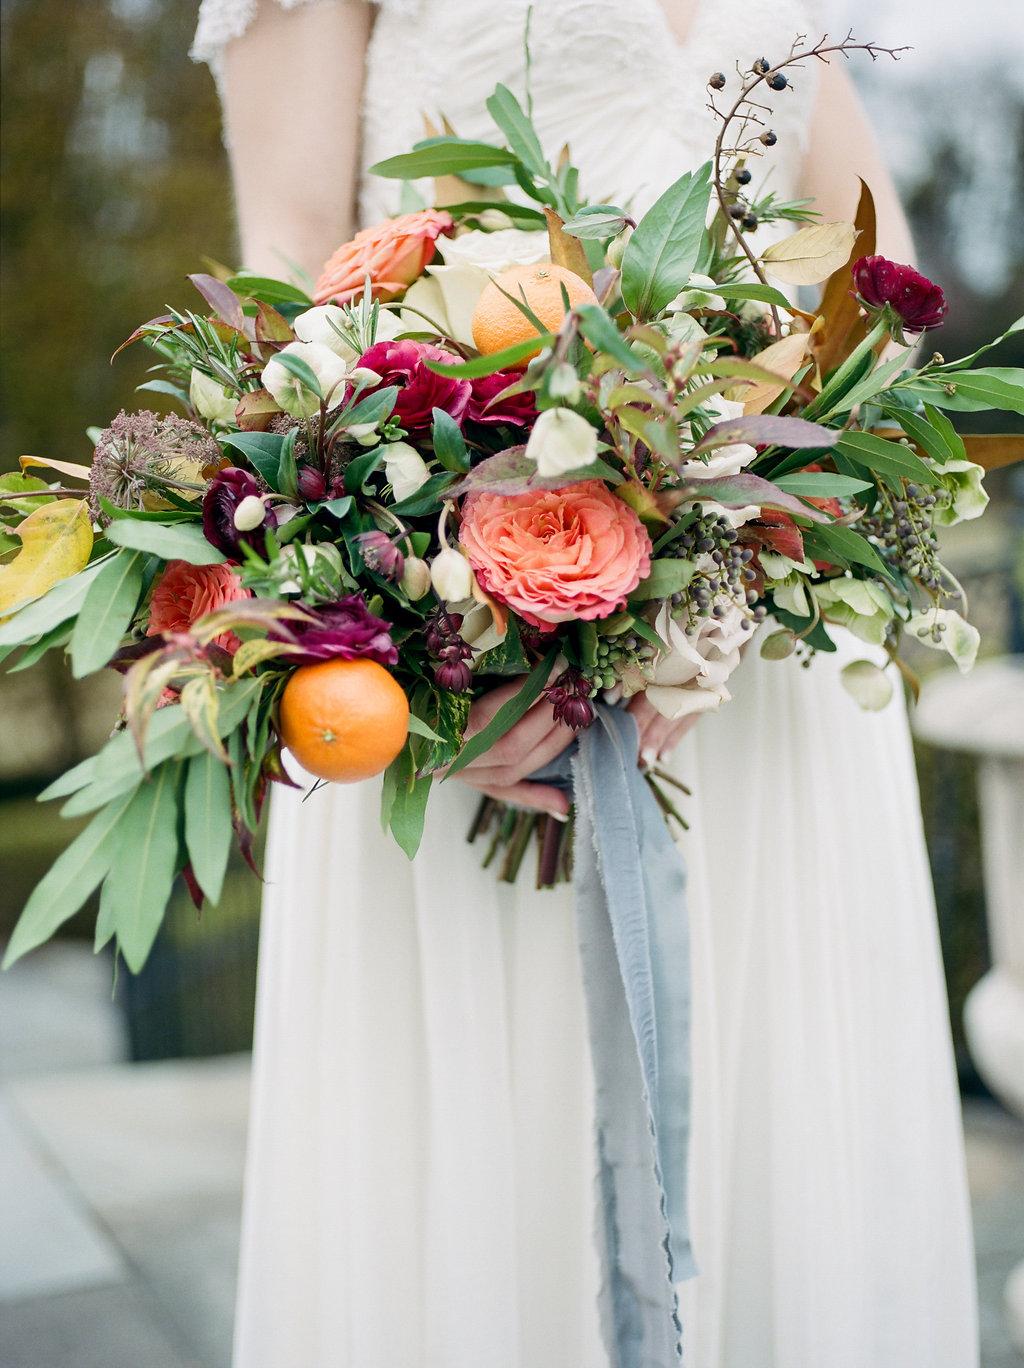 romantic fall wedding bouquets - photo by Lissa Ryan Photography https://ruffledblog.com/modern-romantic-wedding-ideas-with-family-heirlooms